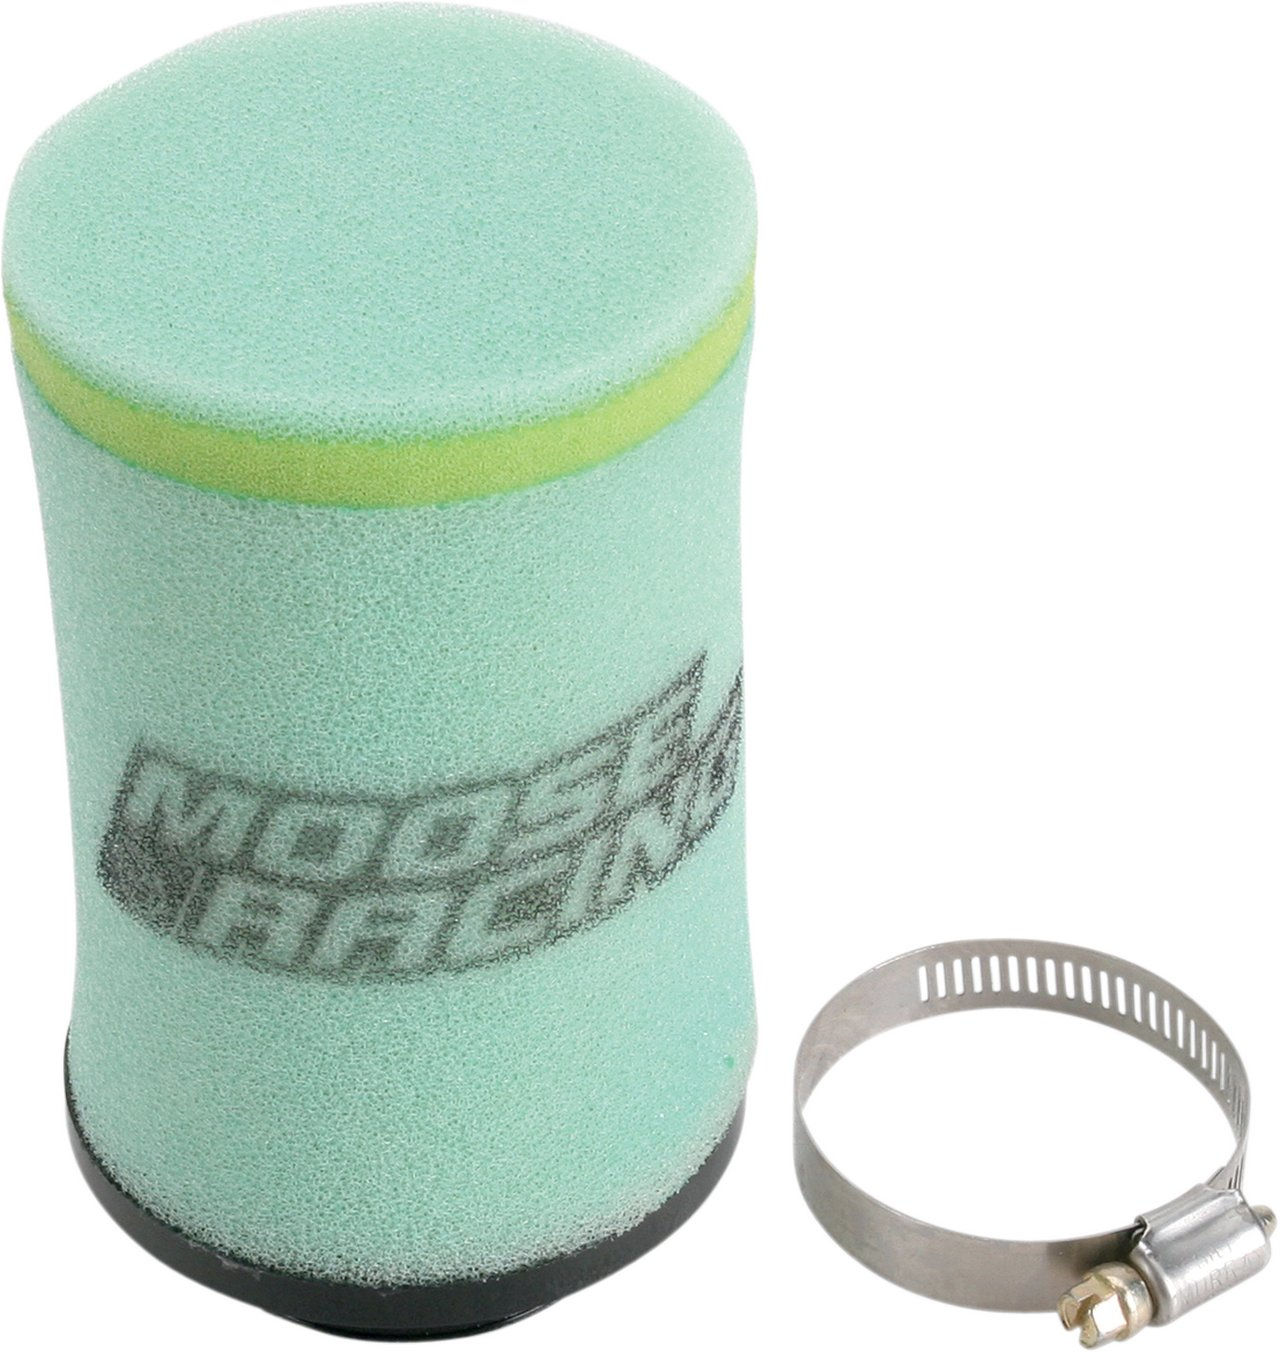 【MOOSE RACING】PPO (PRECISION PRE-OILED) 空氣濾芯 [1011-0854] - 「Webike-摩托百貨」